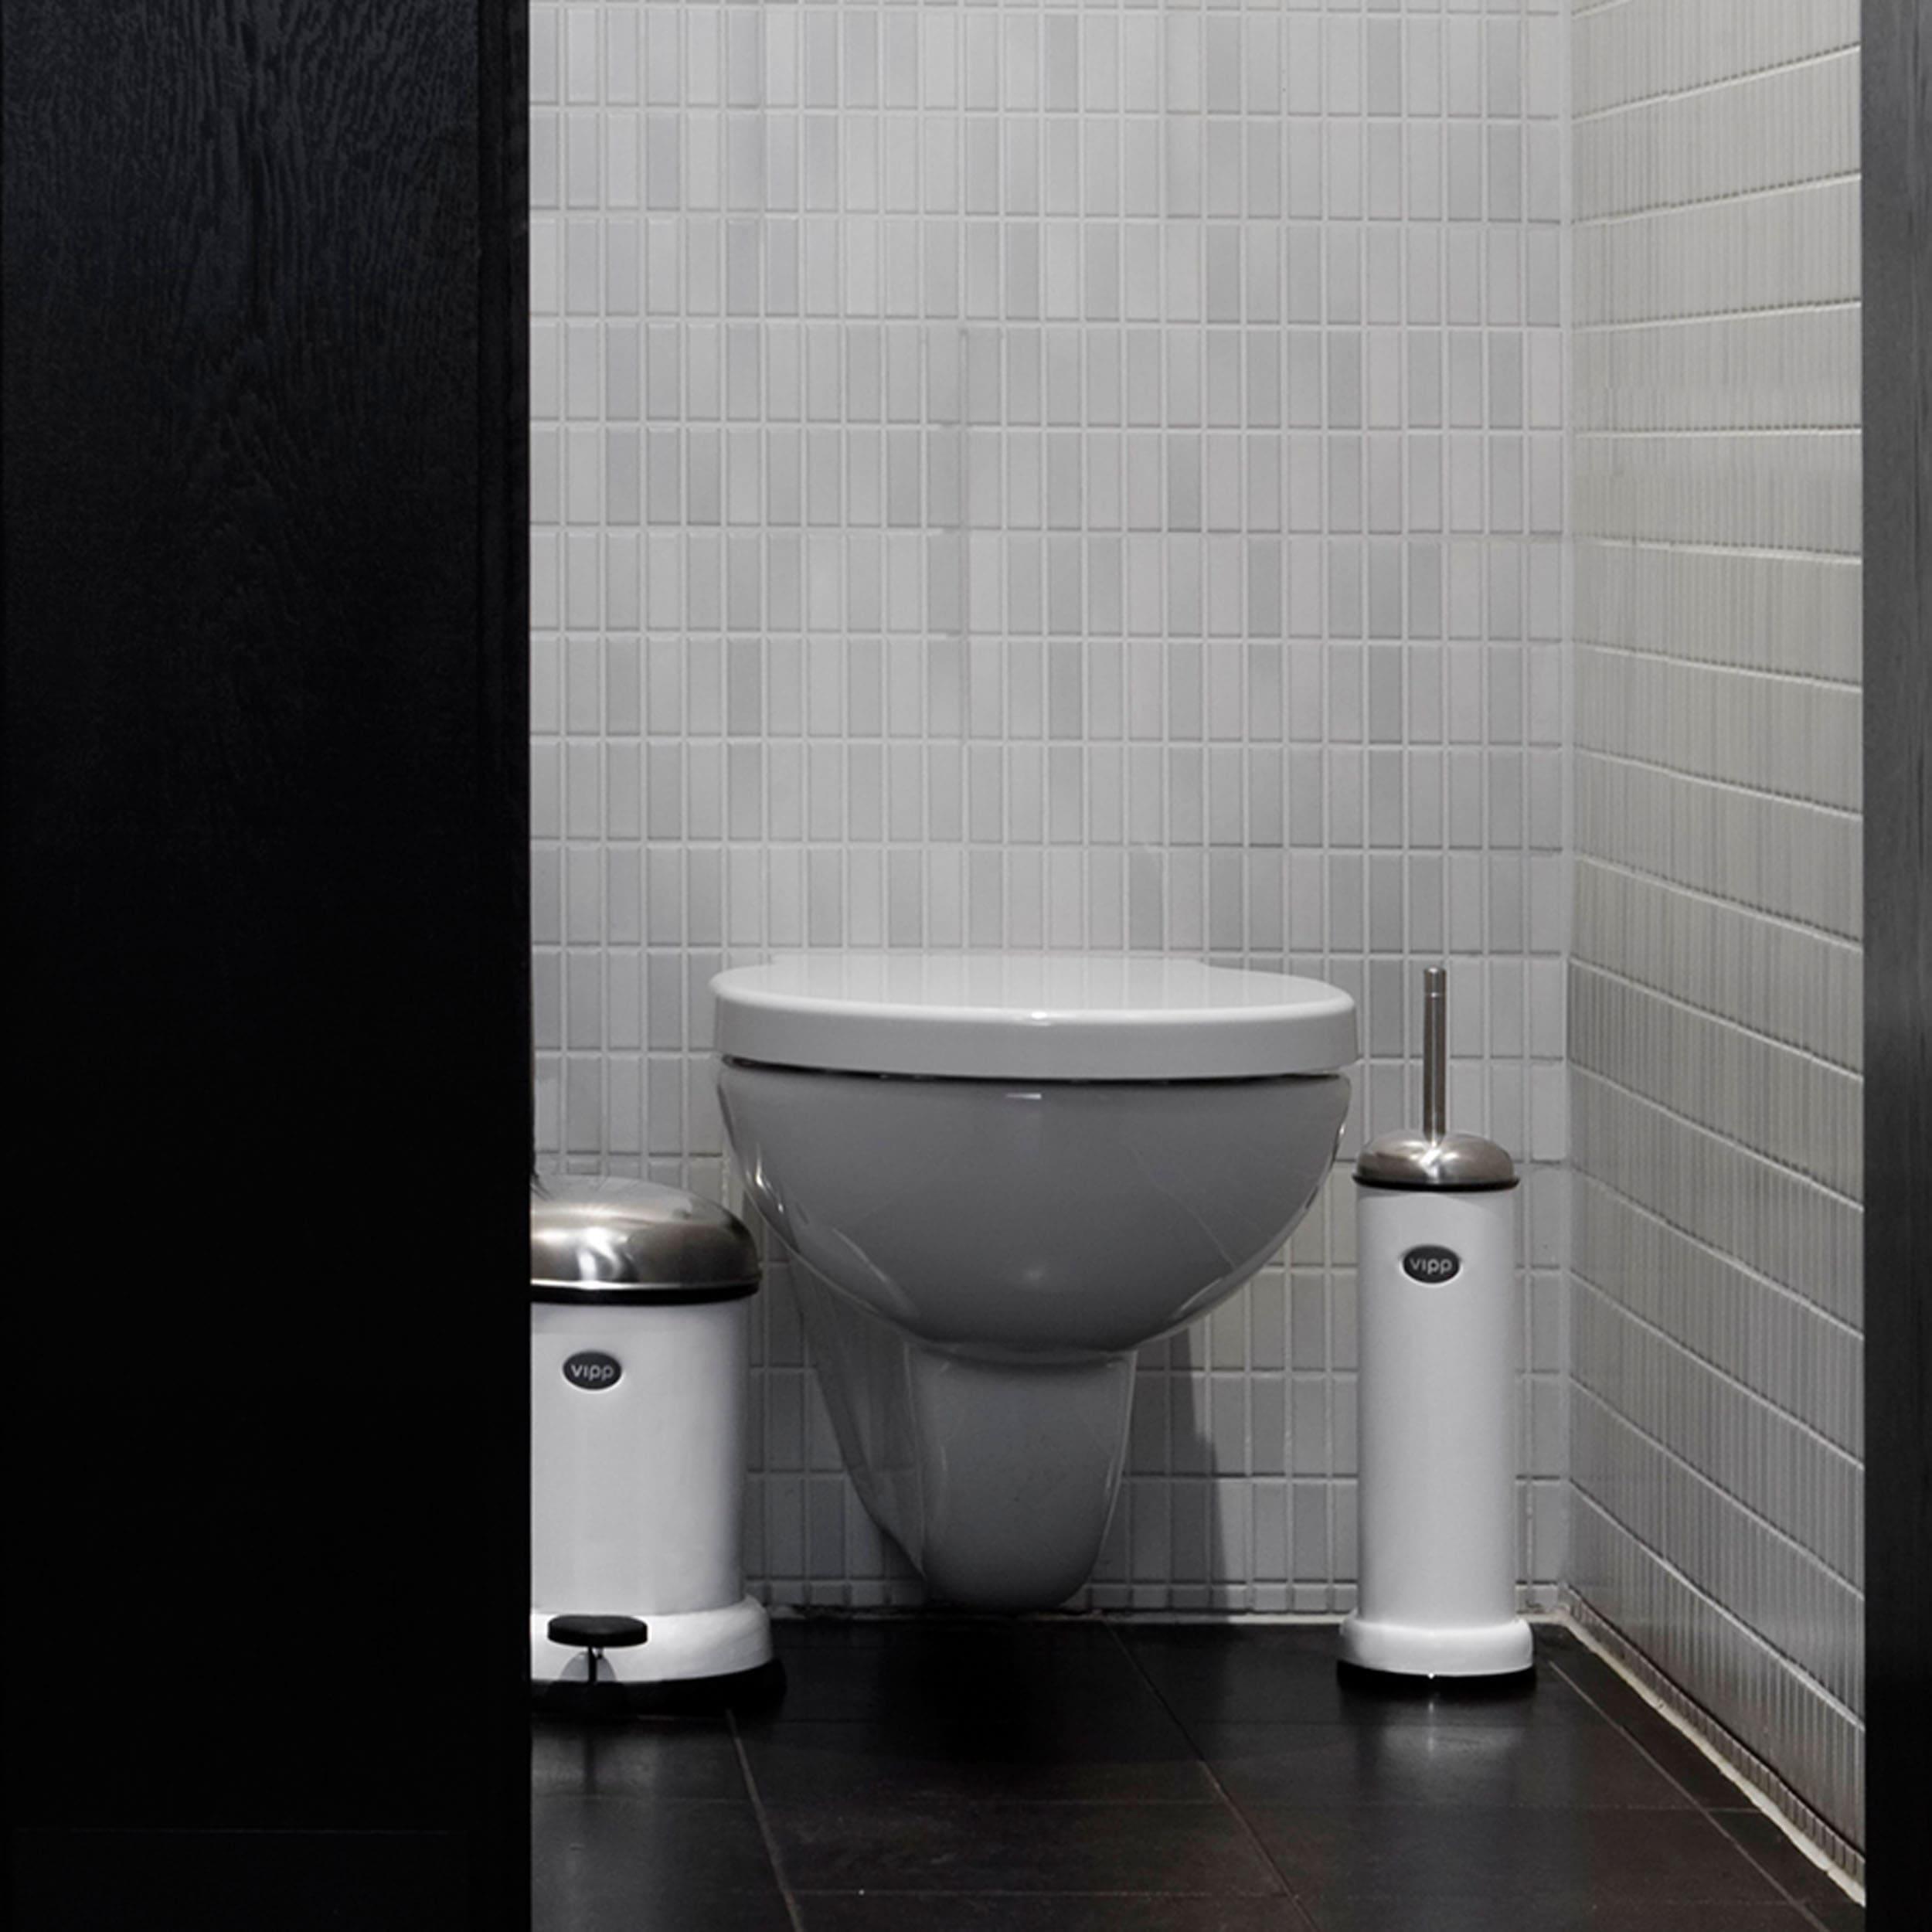 Vipp 11 Toilettenbürste